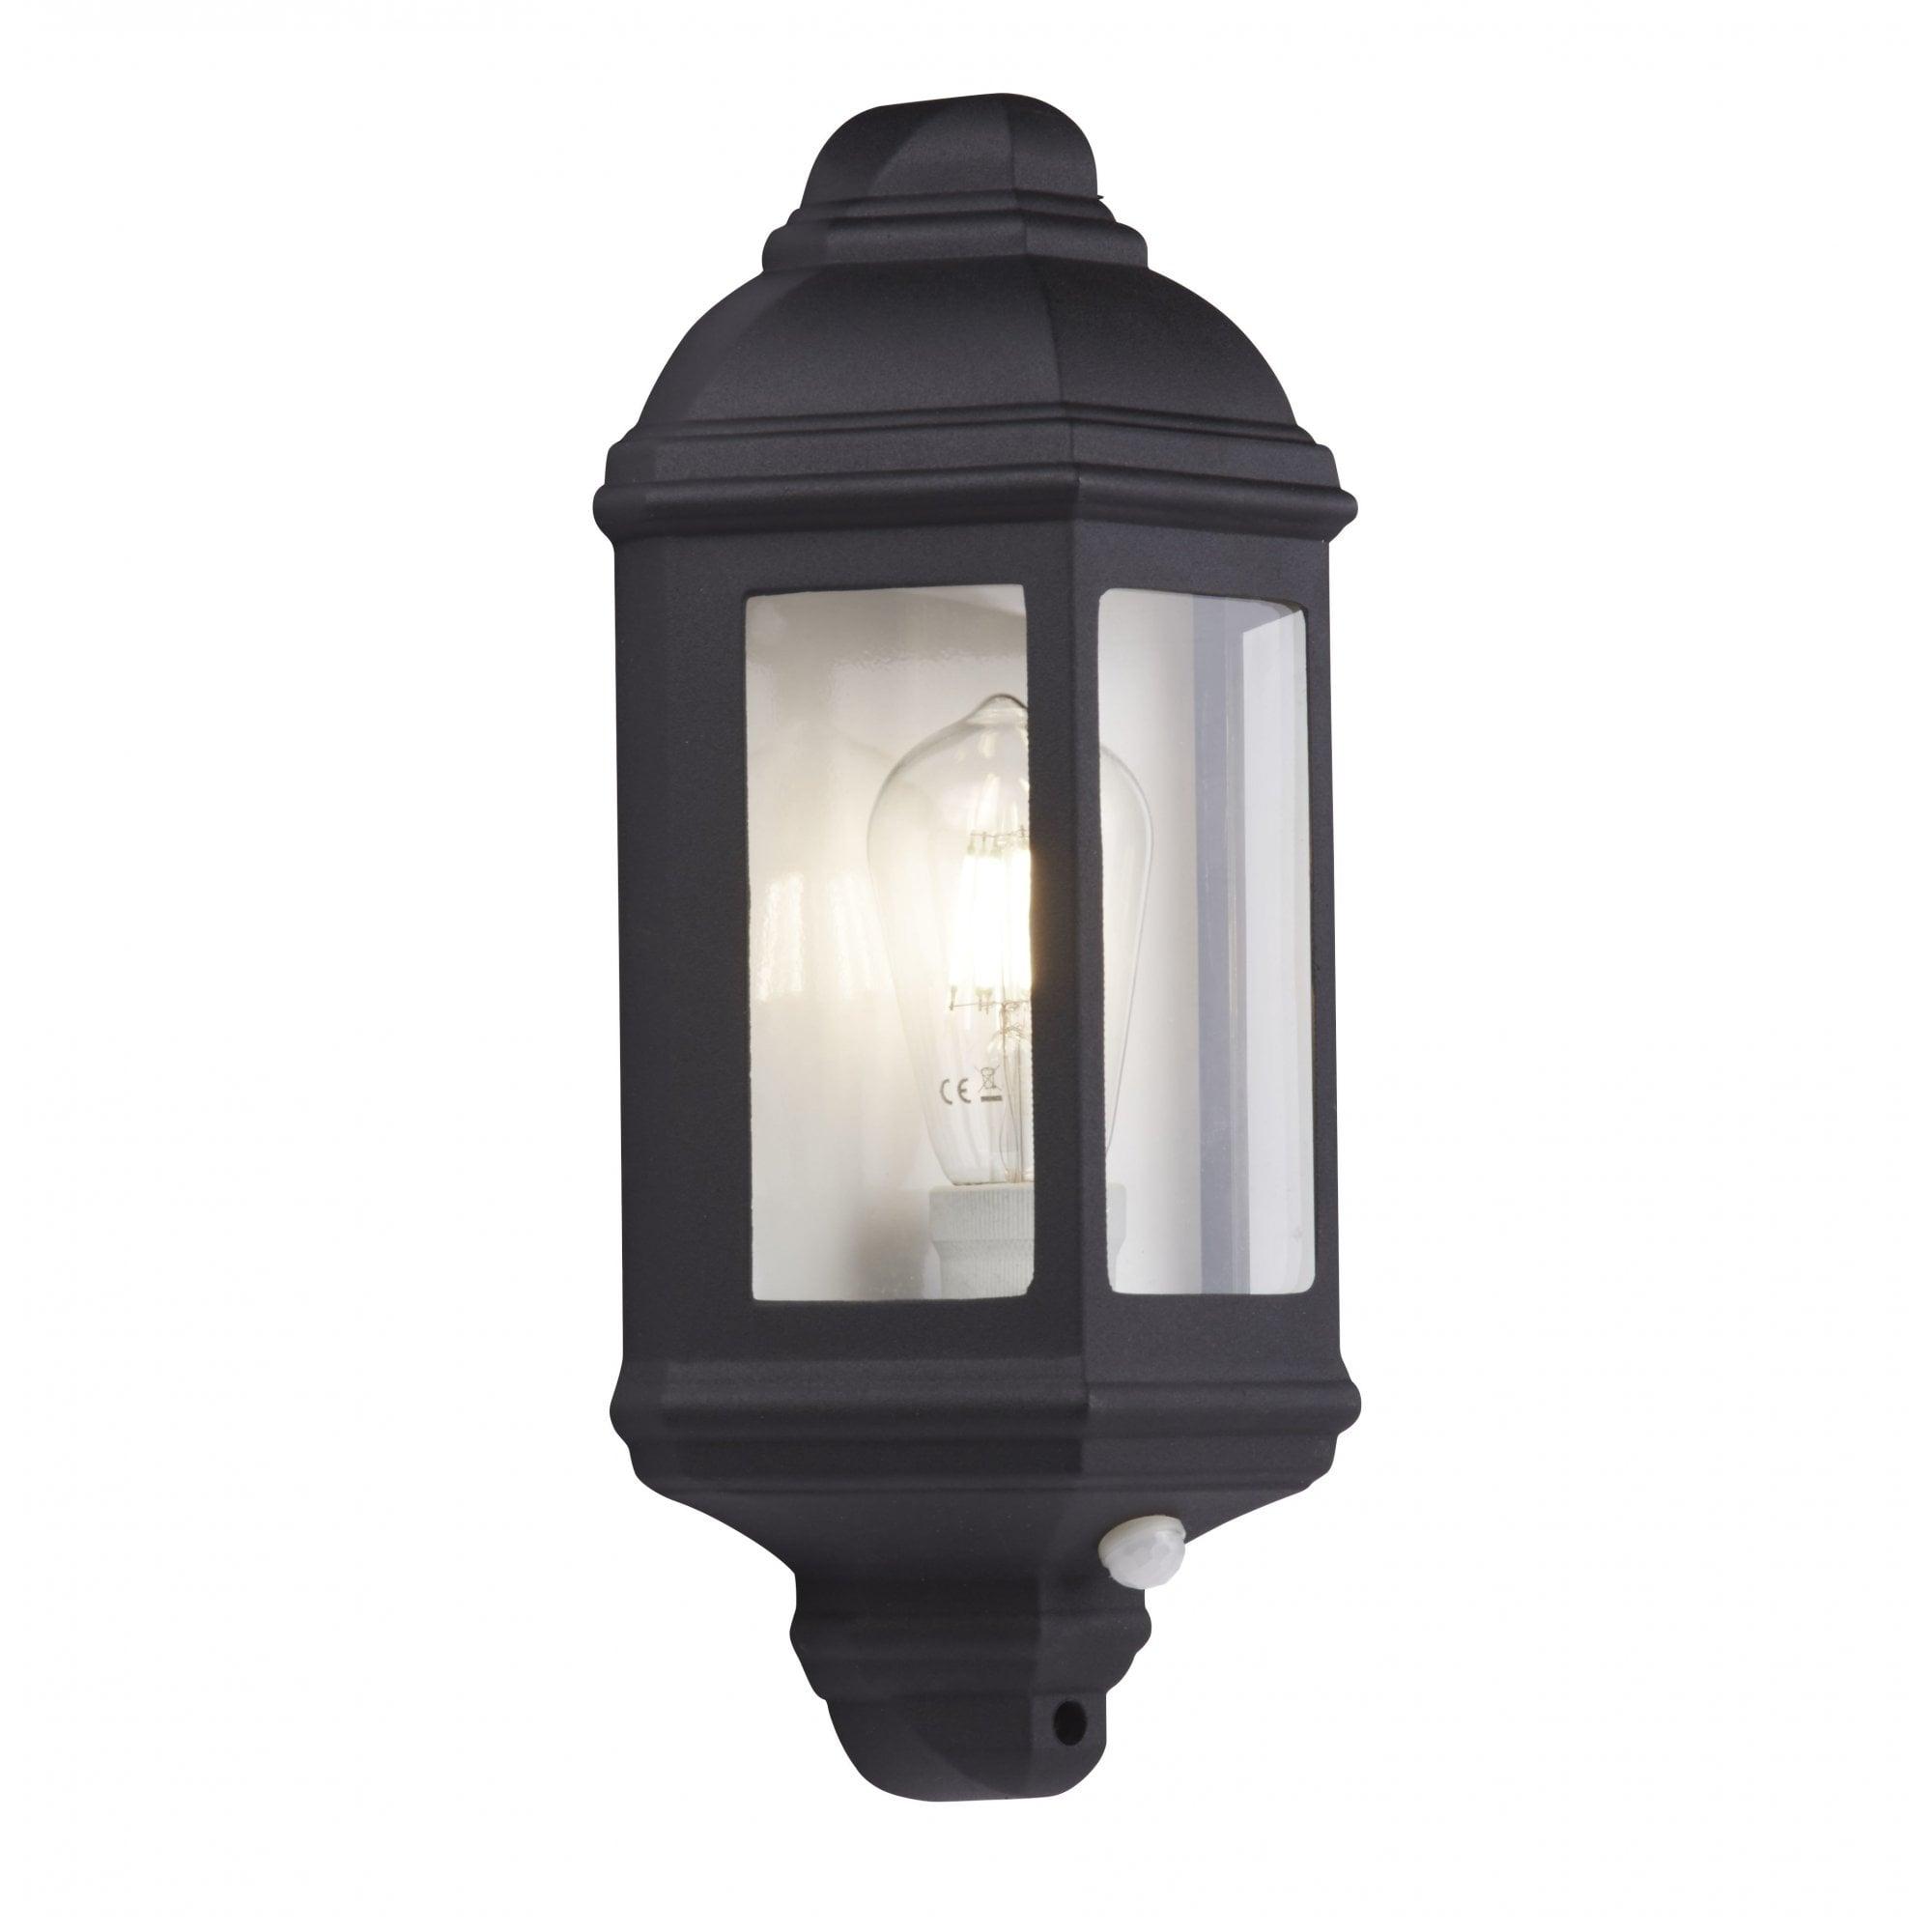 Outdoor Garden Black Finish Stainless Steel PIR Wall Light IP44